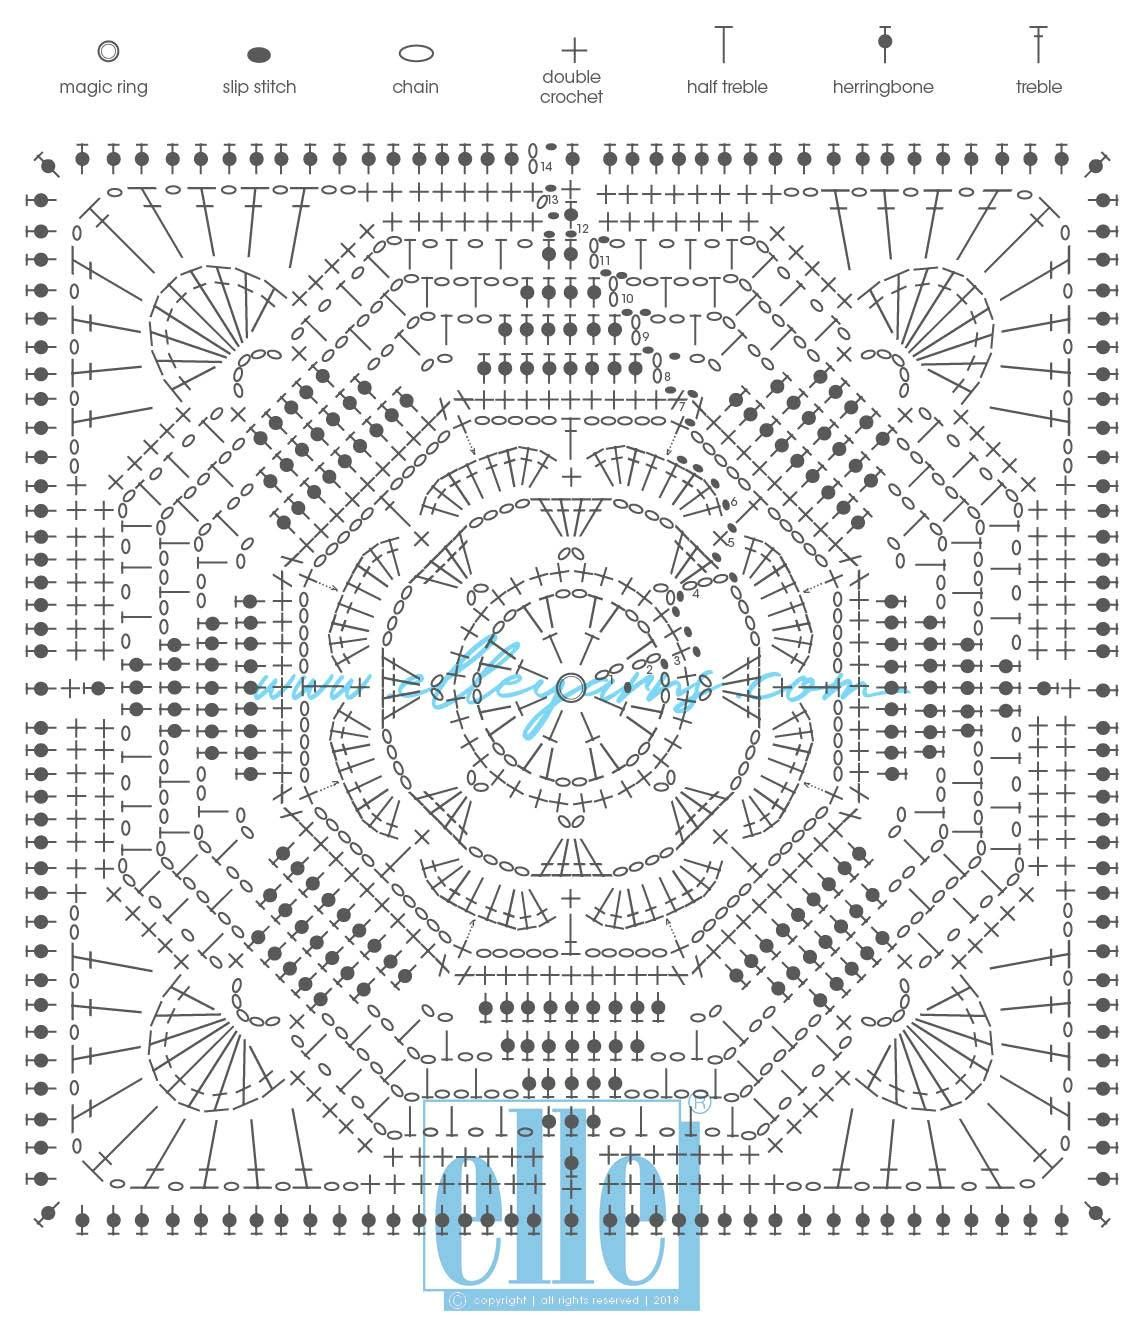 Calsquare9 Chart